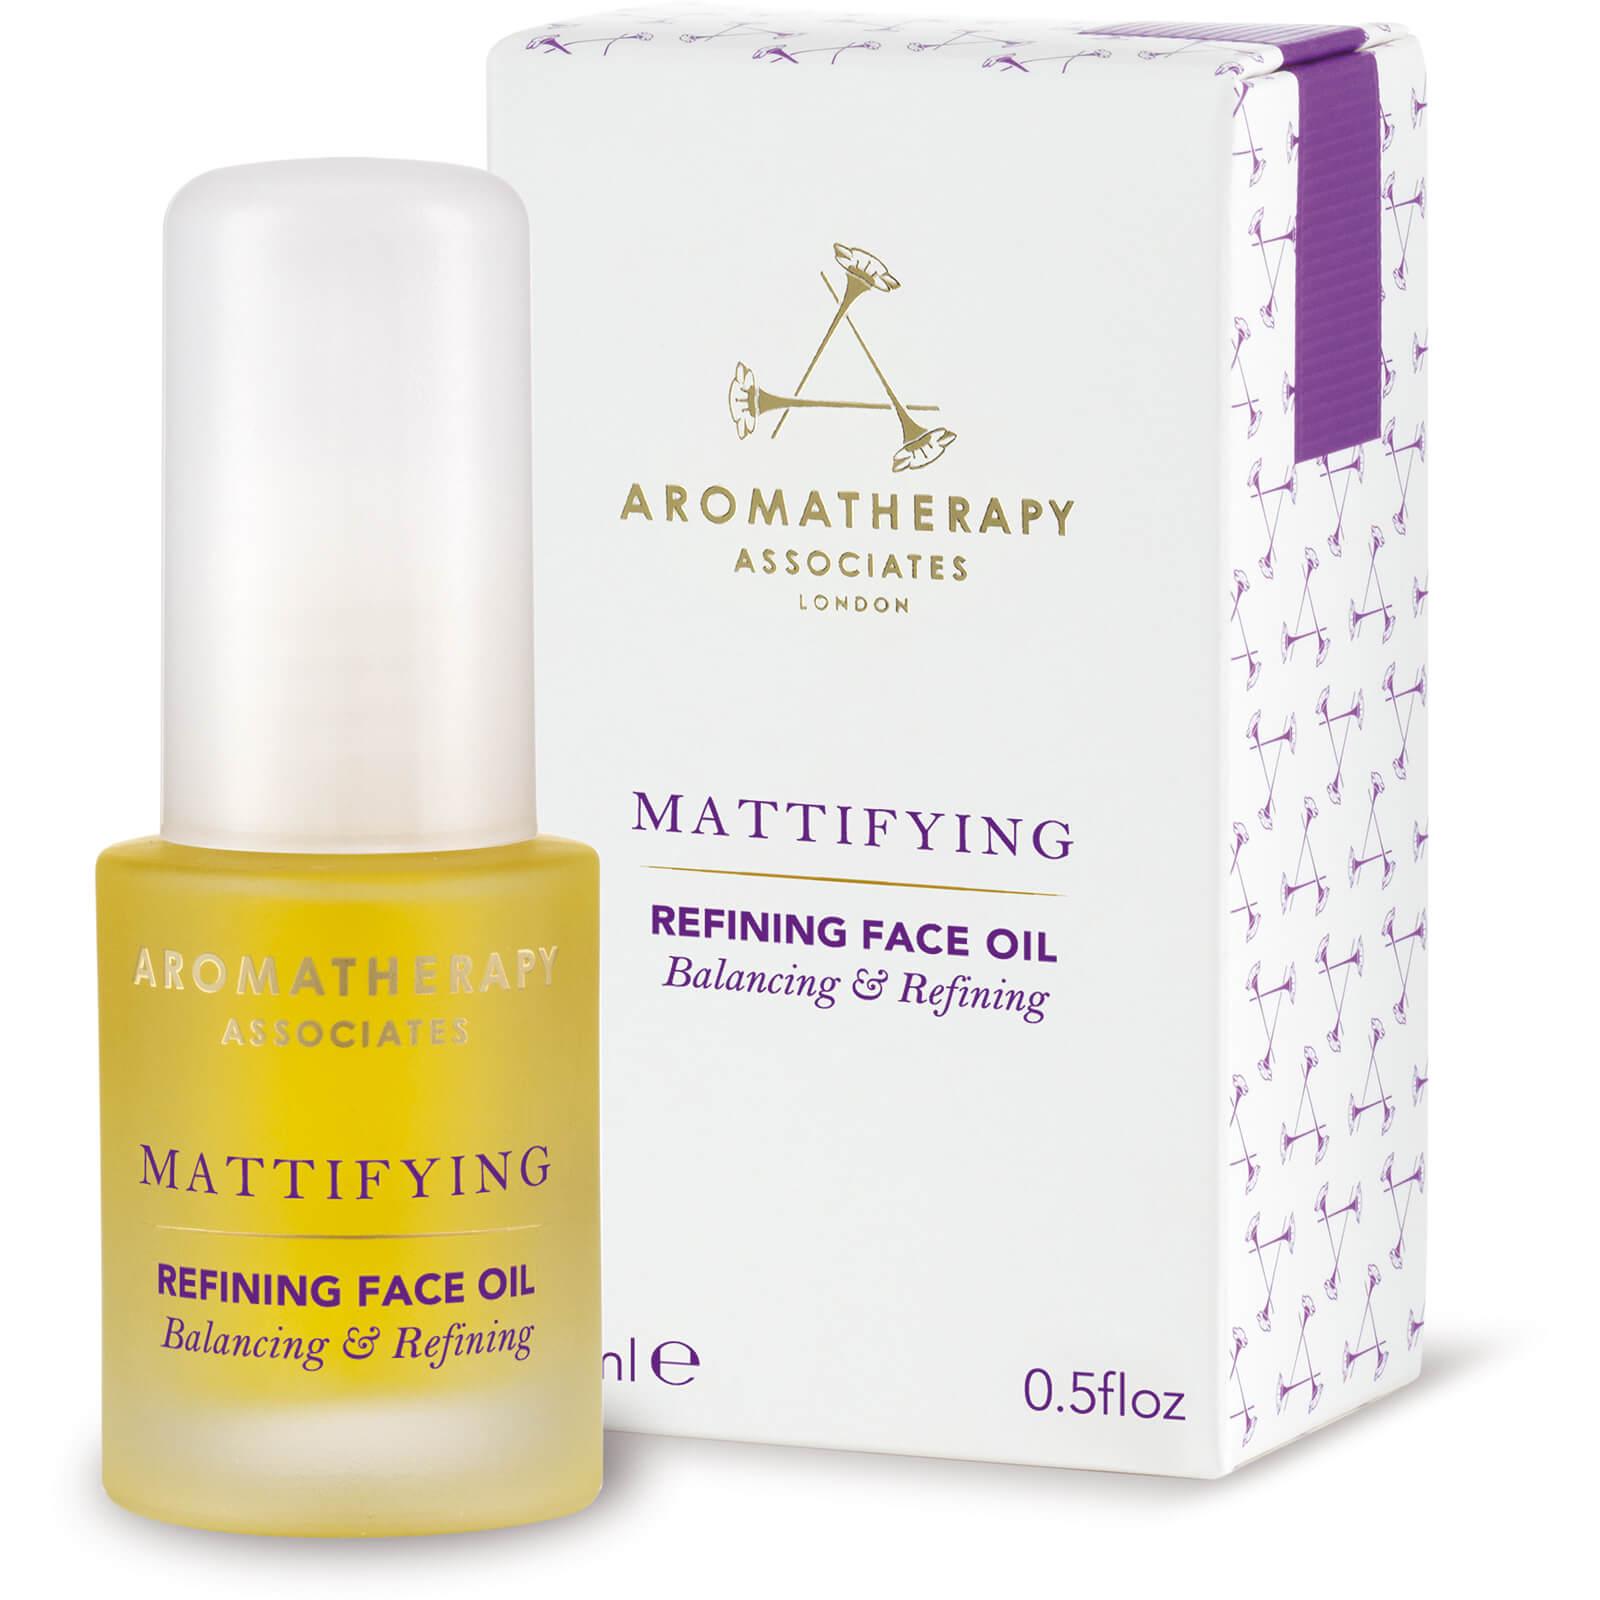 Look Fantastic coupon: Aromatherapy Associates Refining Face Oil 1oz